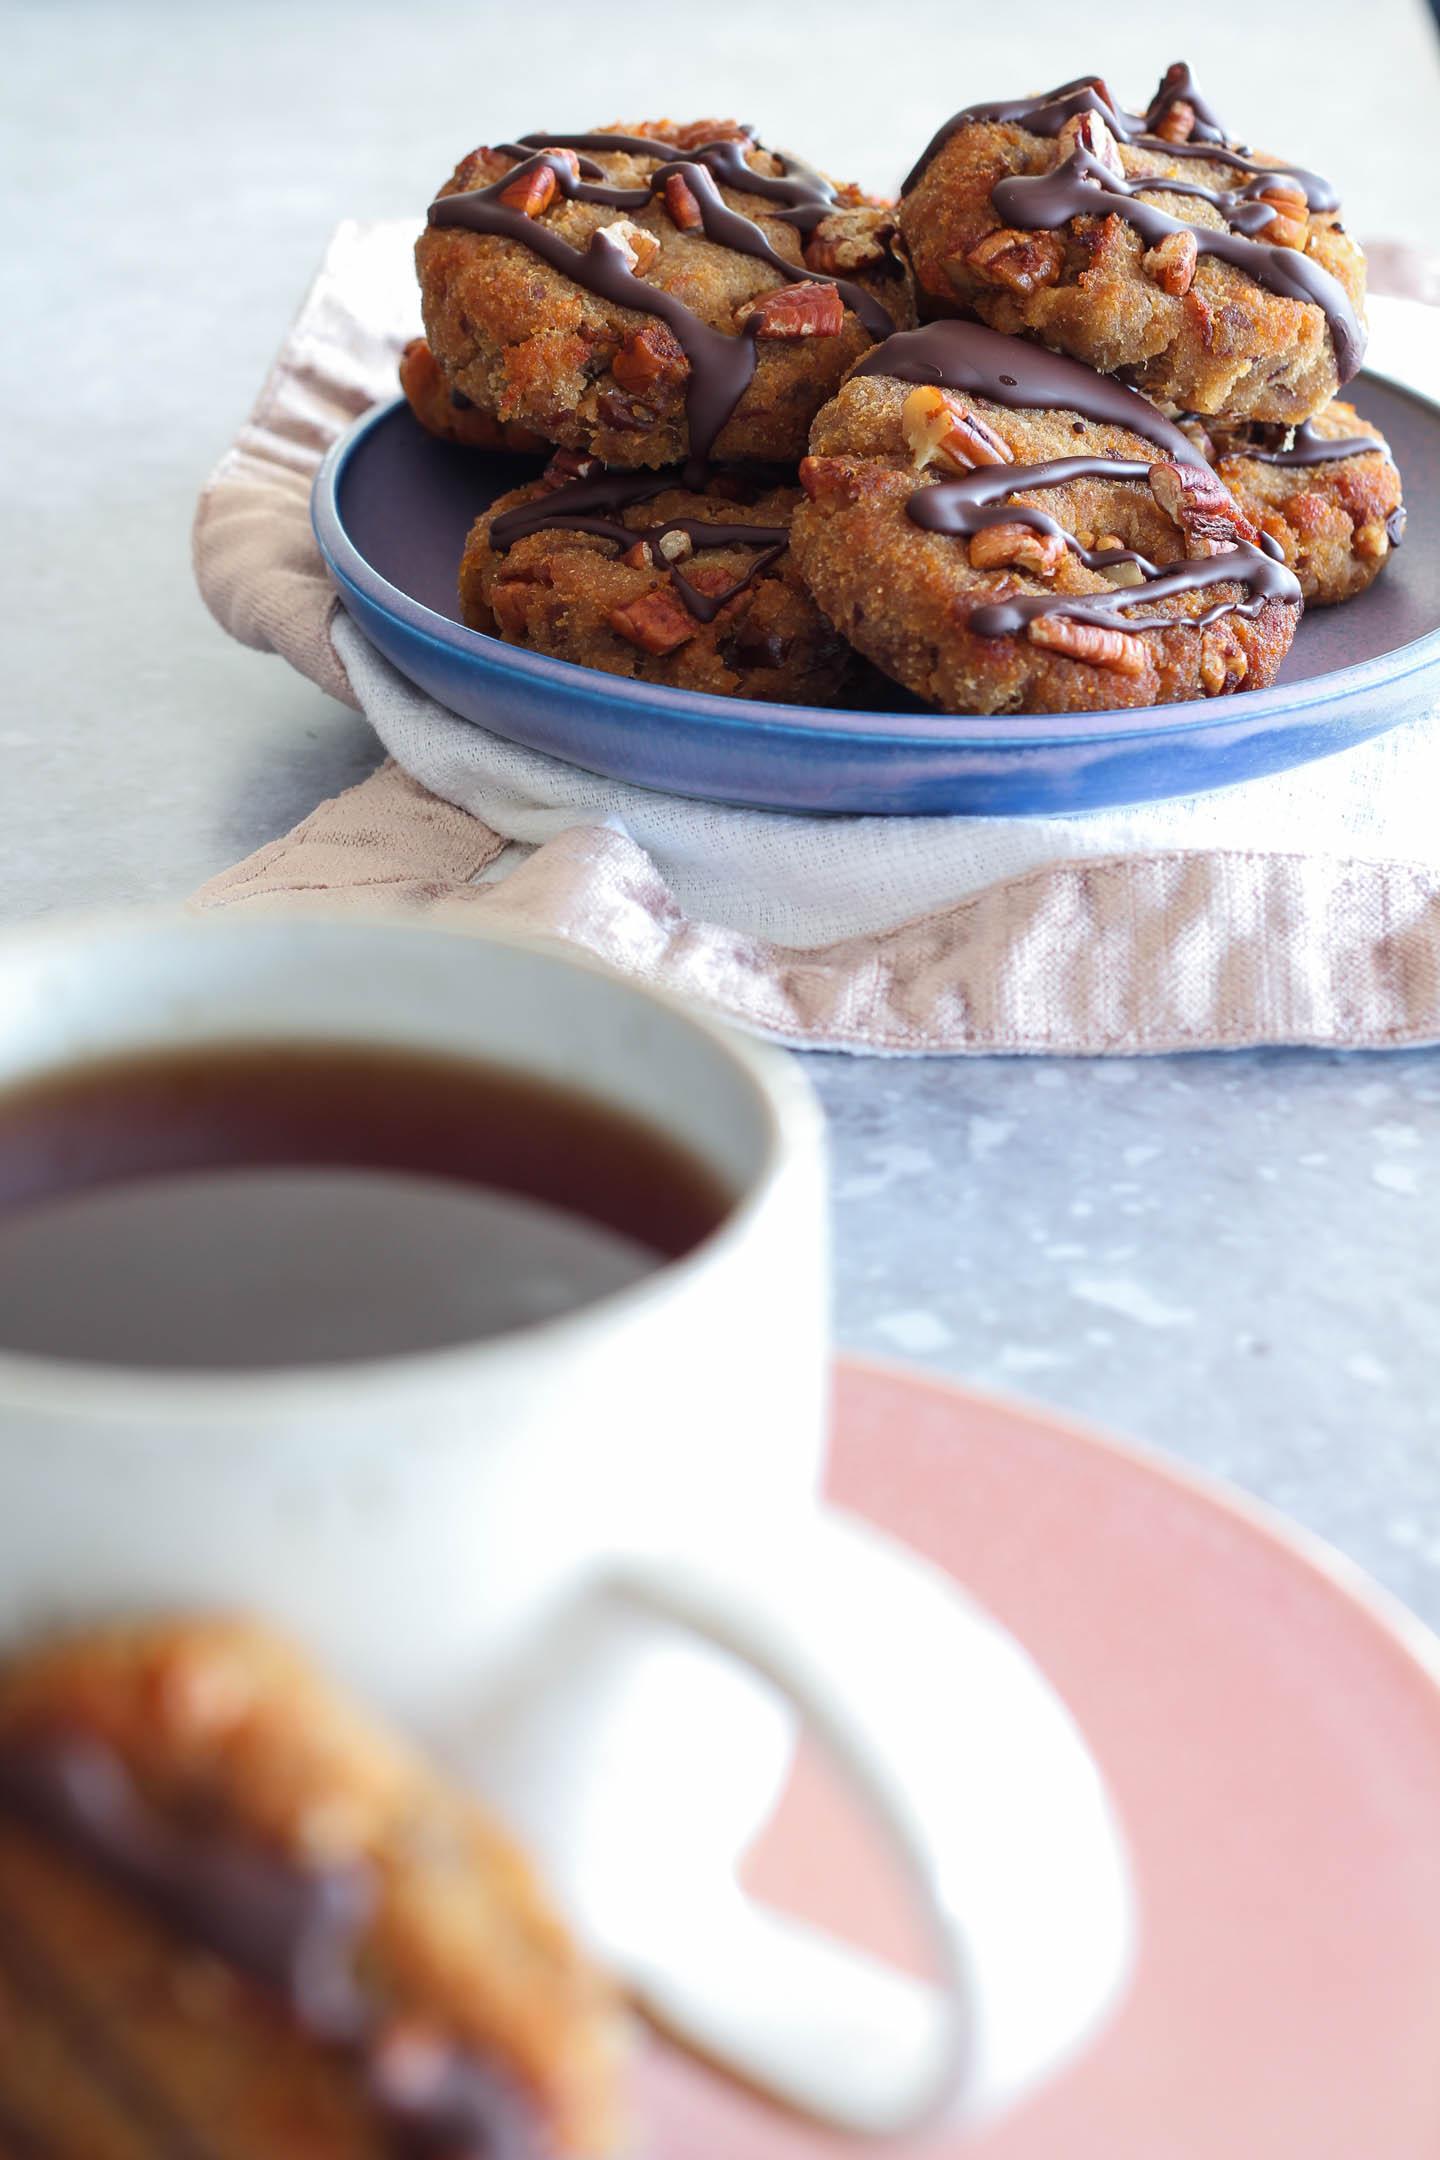 Banana Date and Pecan Collagen Cookies served with tea